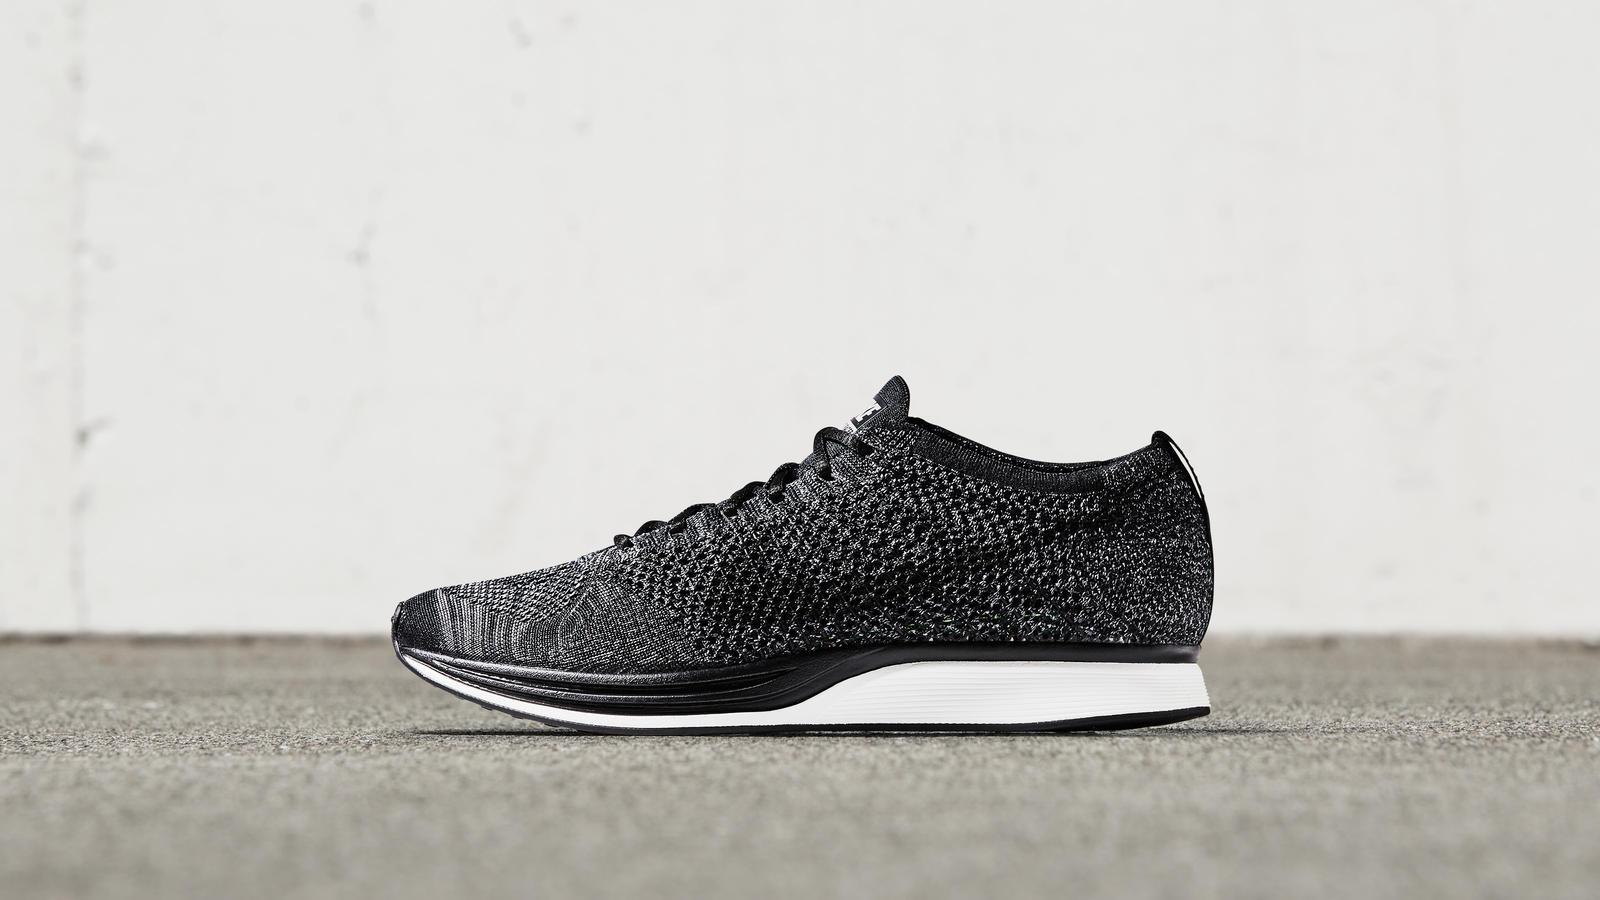 Nike Flyknit Racer- Pitch Black - Ape to Gentleman